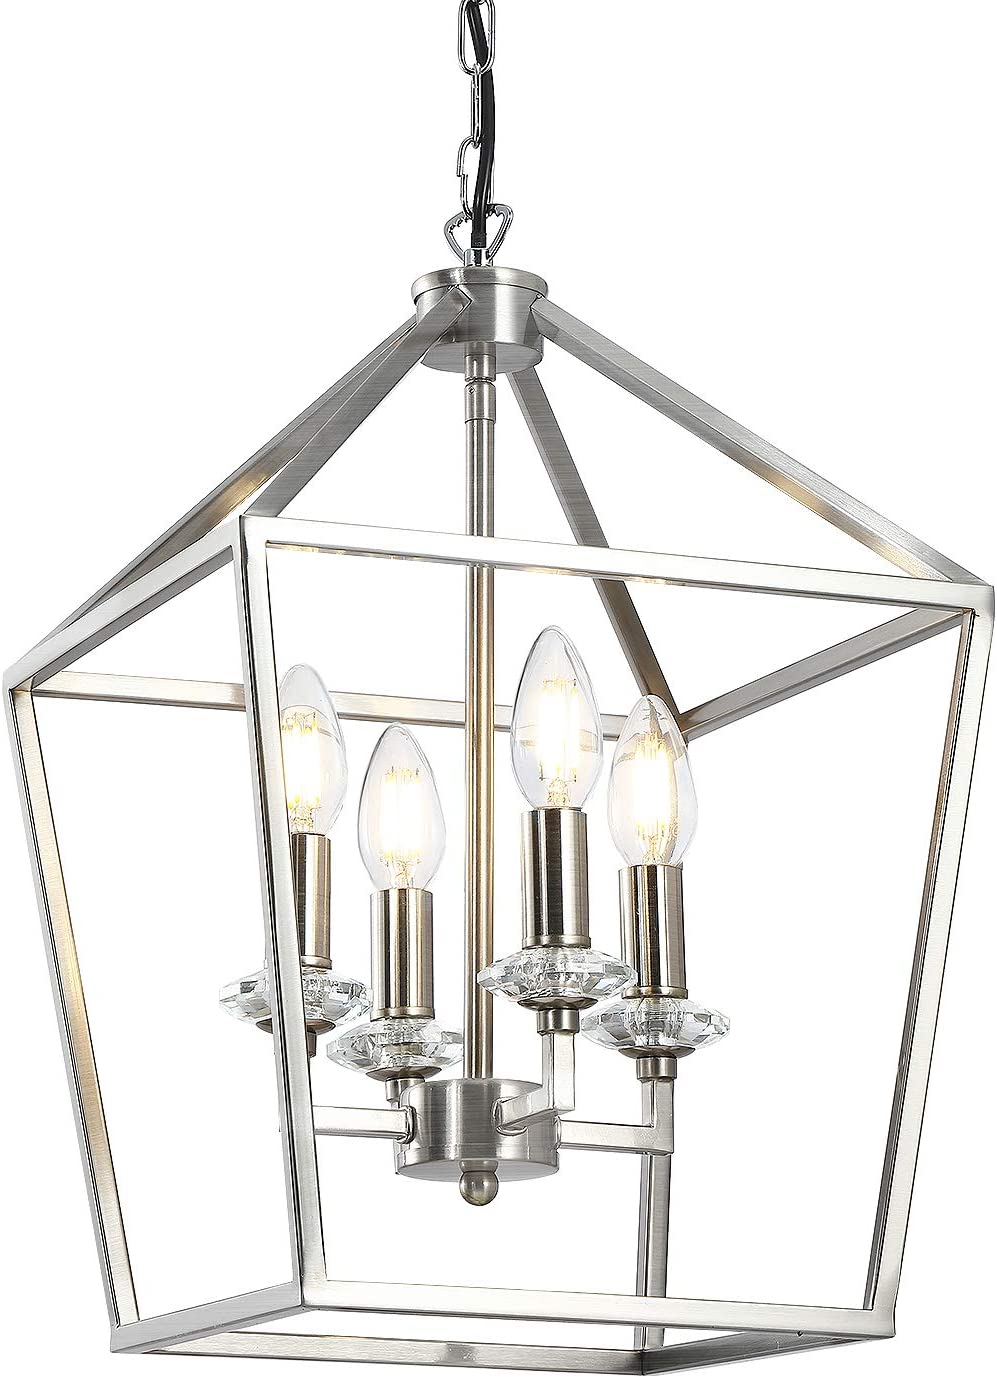 Foyer Lantern Pendant Light, 9 Light Brushed Nickel Hanging Light Fixtures  Chandelier with Crystal Lamp Base for Kitchen Island Dining Room Foyer ...